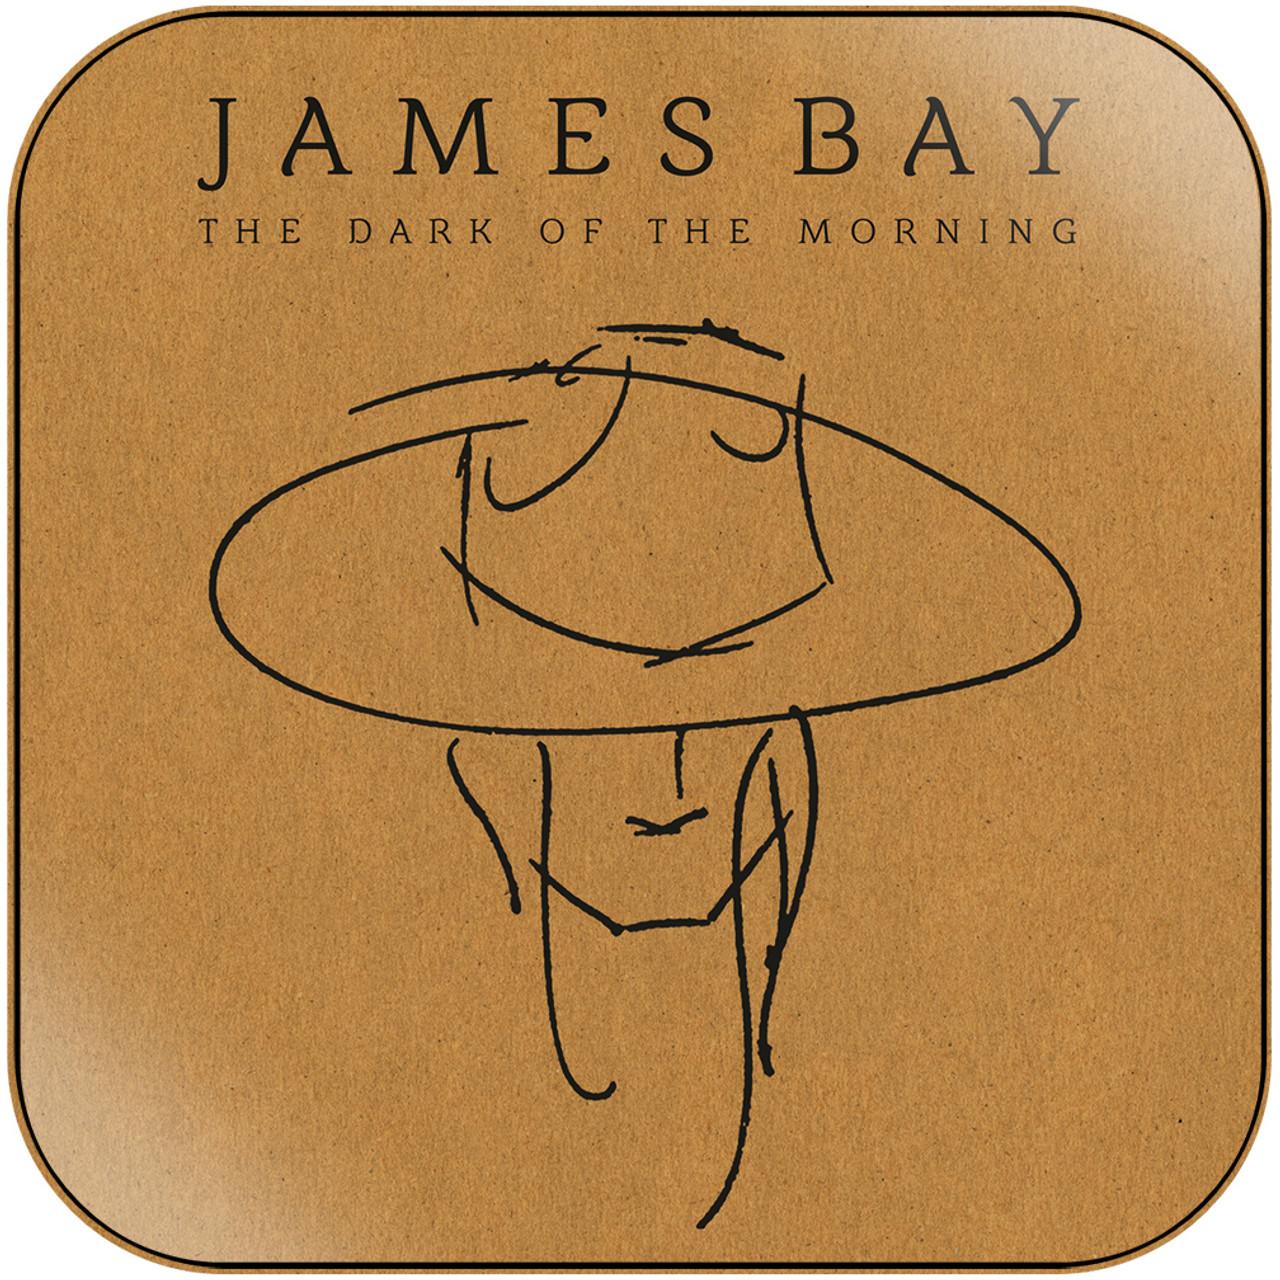 James Bay - Promise And Terror Album Cover Sticker Album Cover Sticker